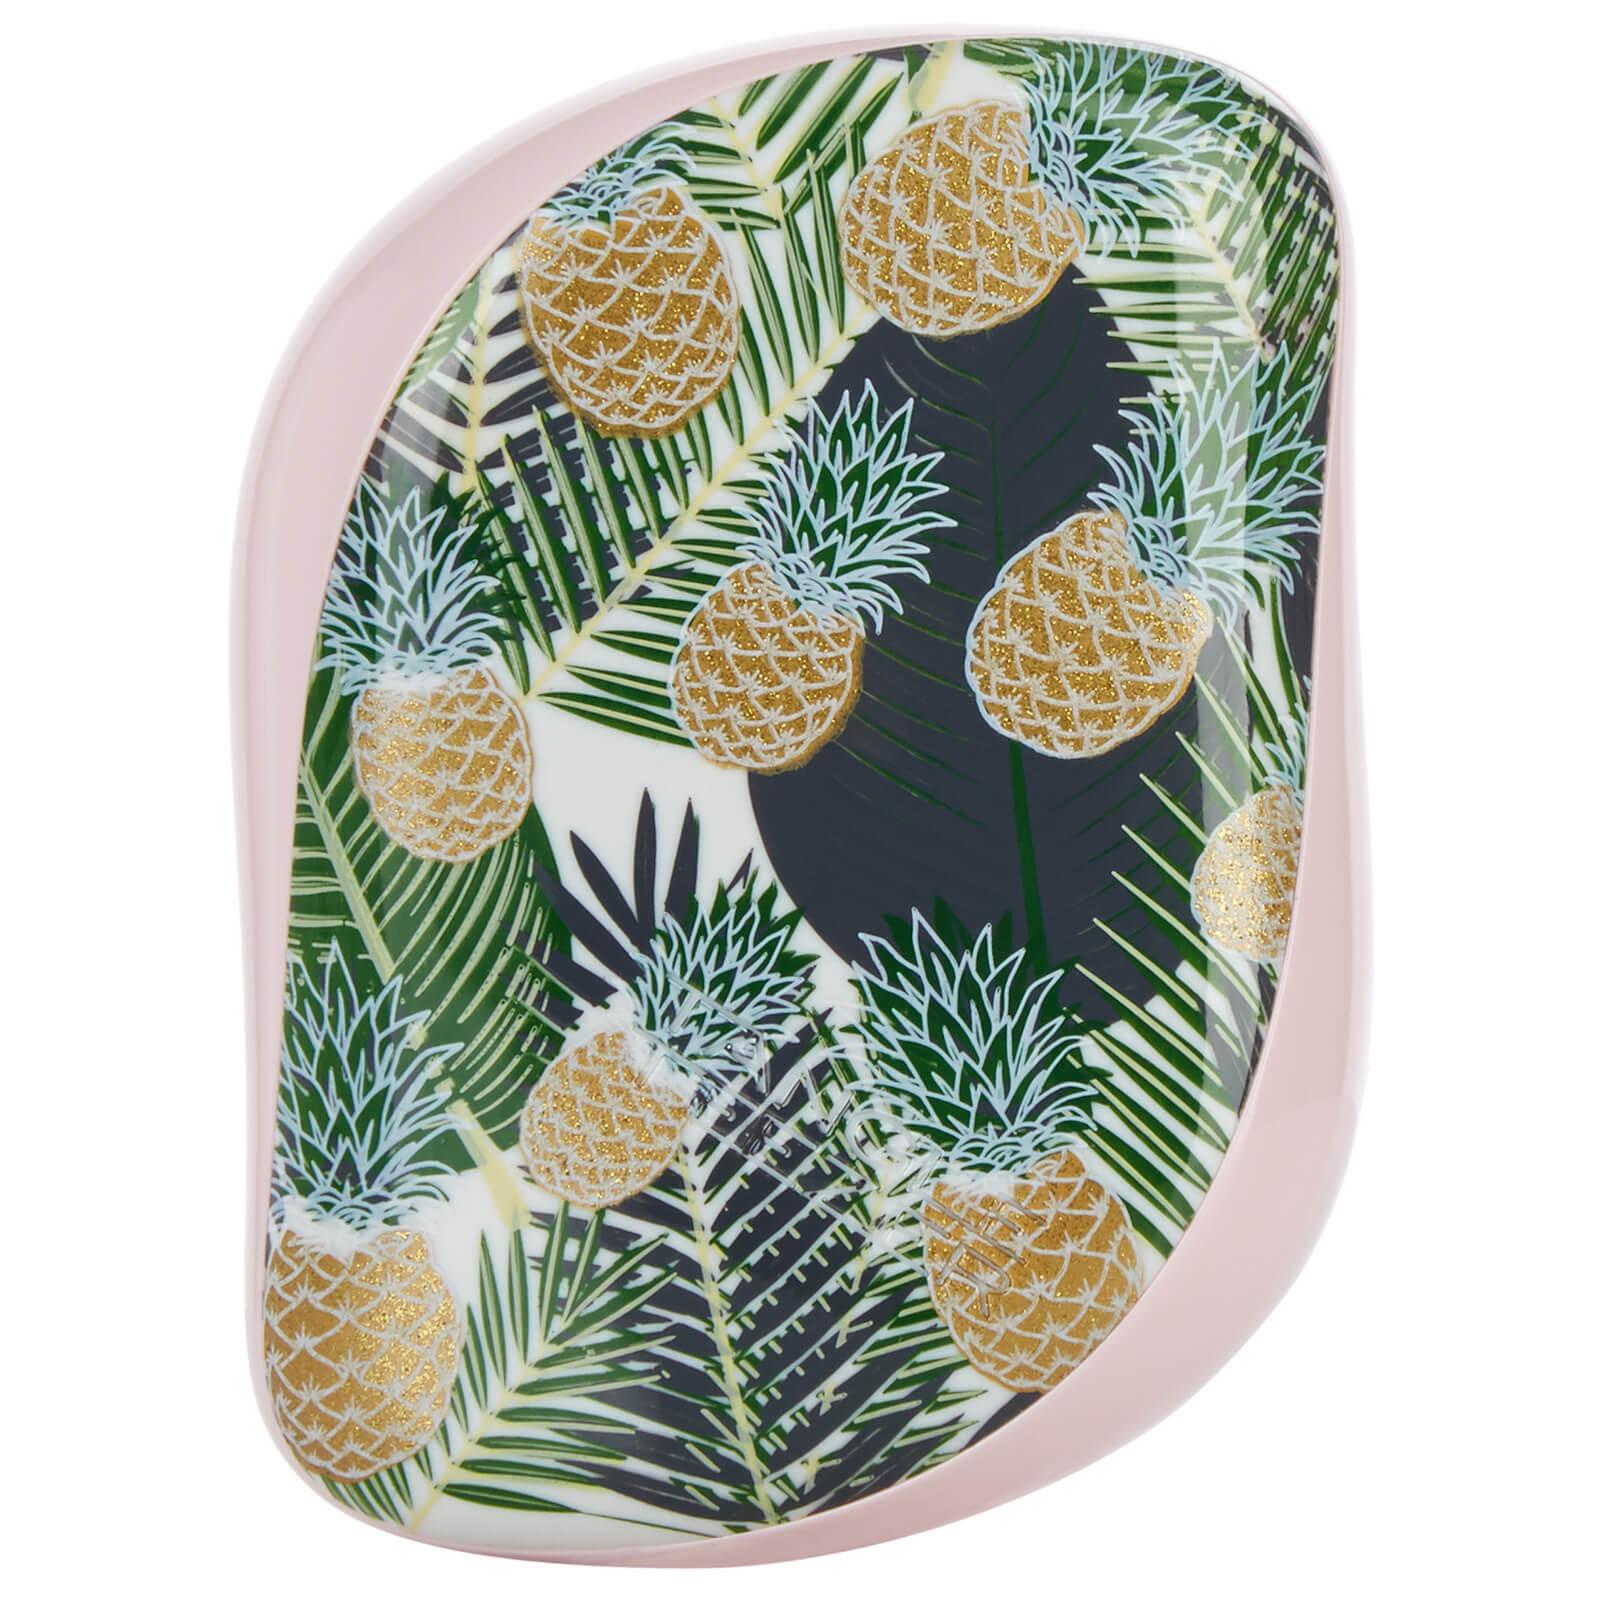 Tangle Teezer Palms & Pineapples Compact Styler Detangling Hairbrush